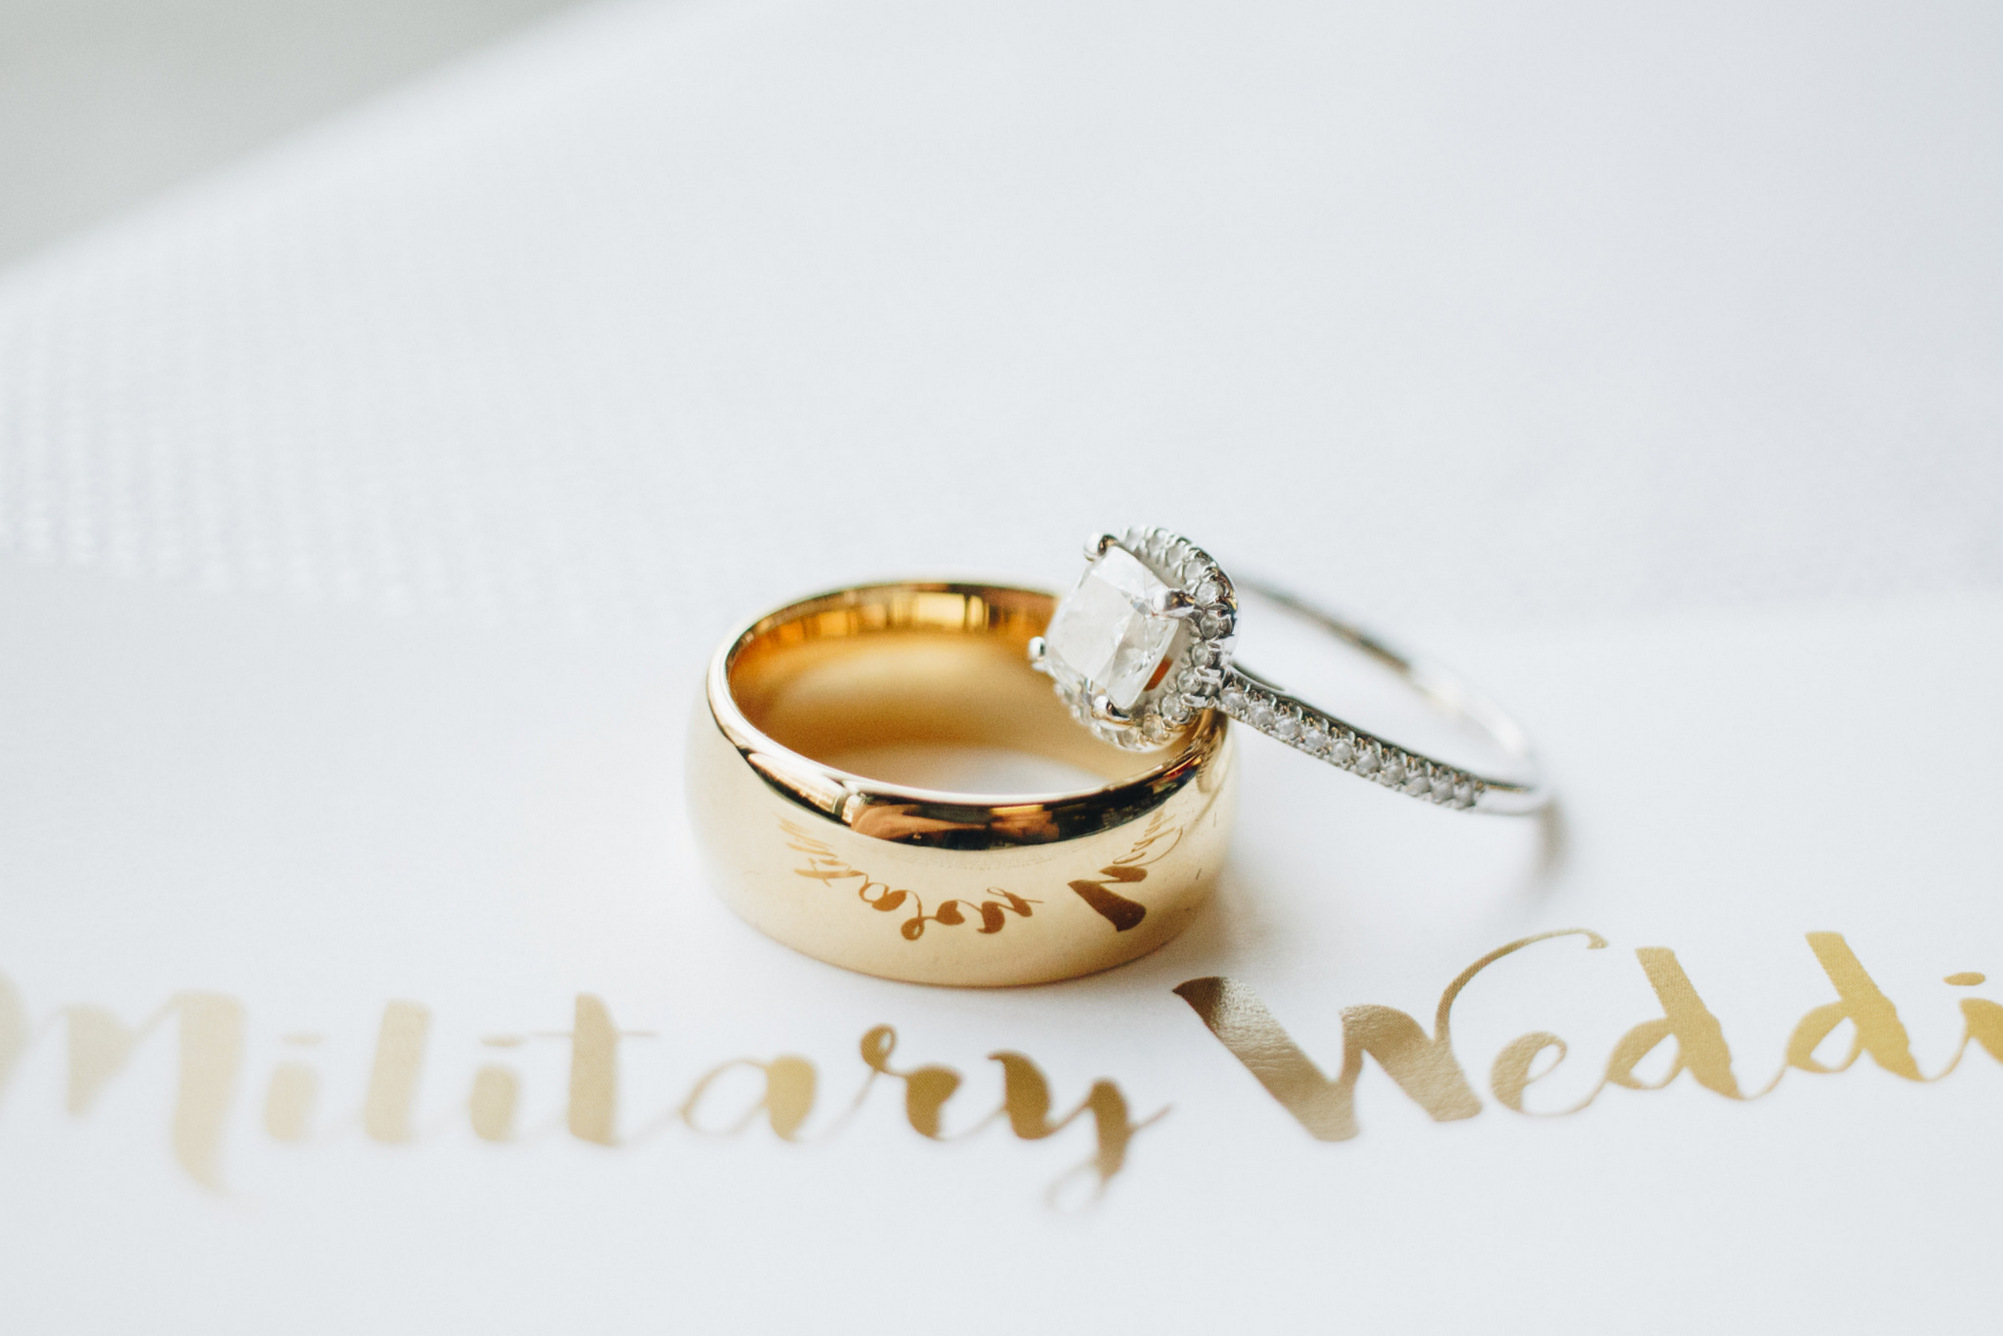 military wedding (ring shot) in bellingham, washington